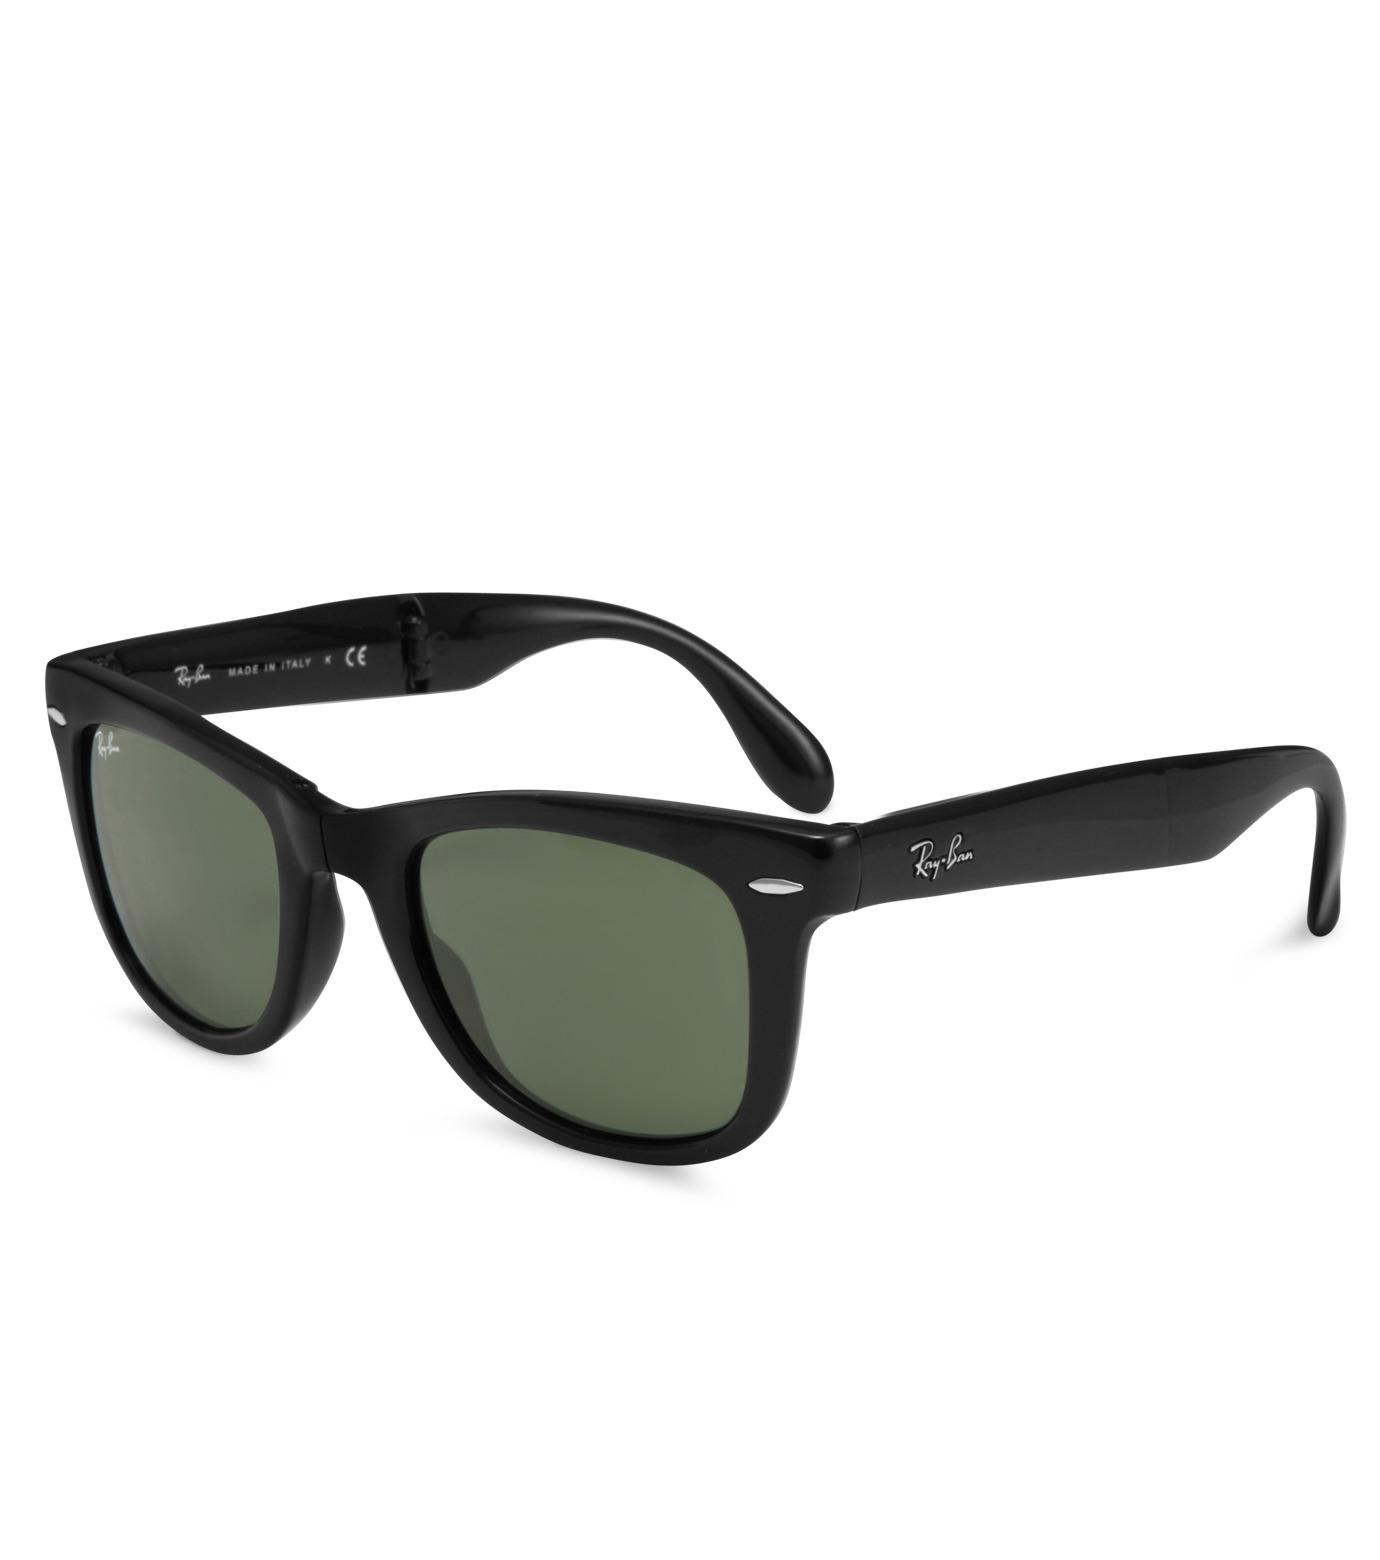 Ray-Ban(レイバン)のWayfarer Normal Black-BLACK(アイウェア/eyewear)-BR-4105-13 拡大詳細画像1